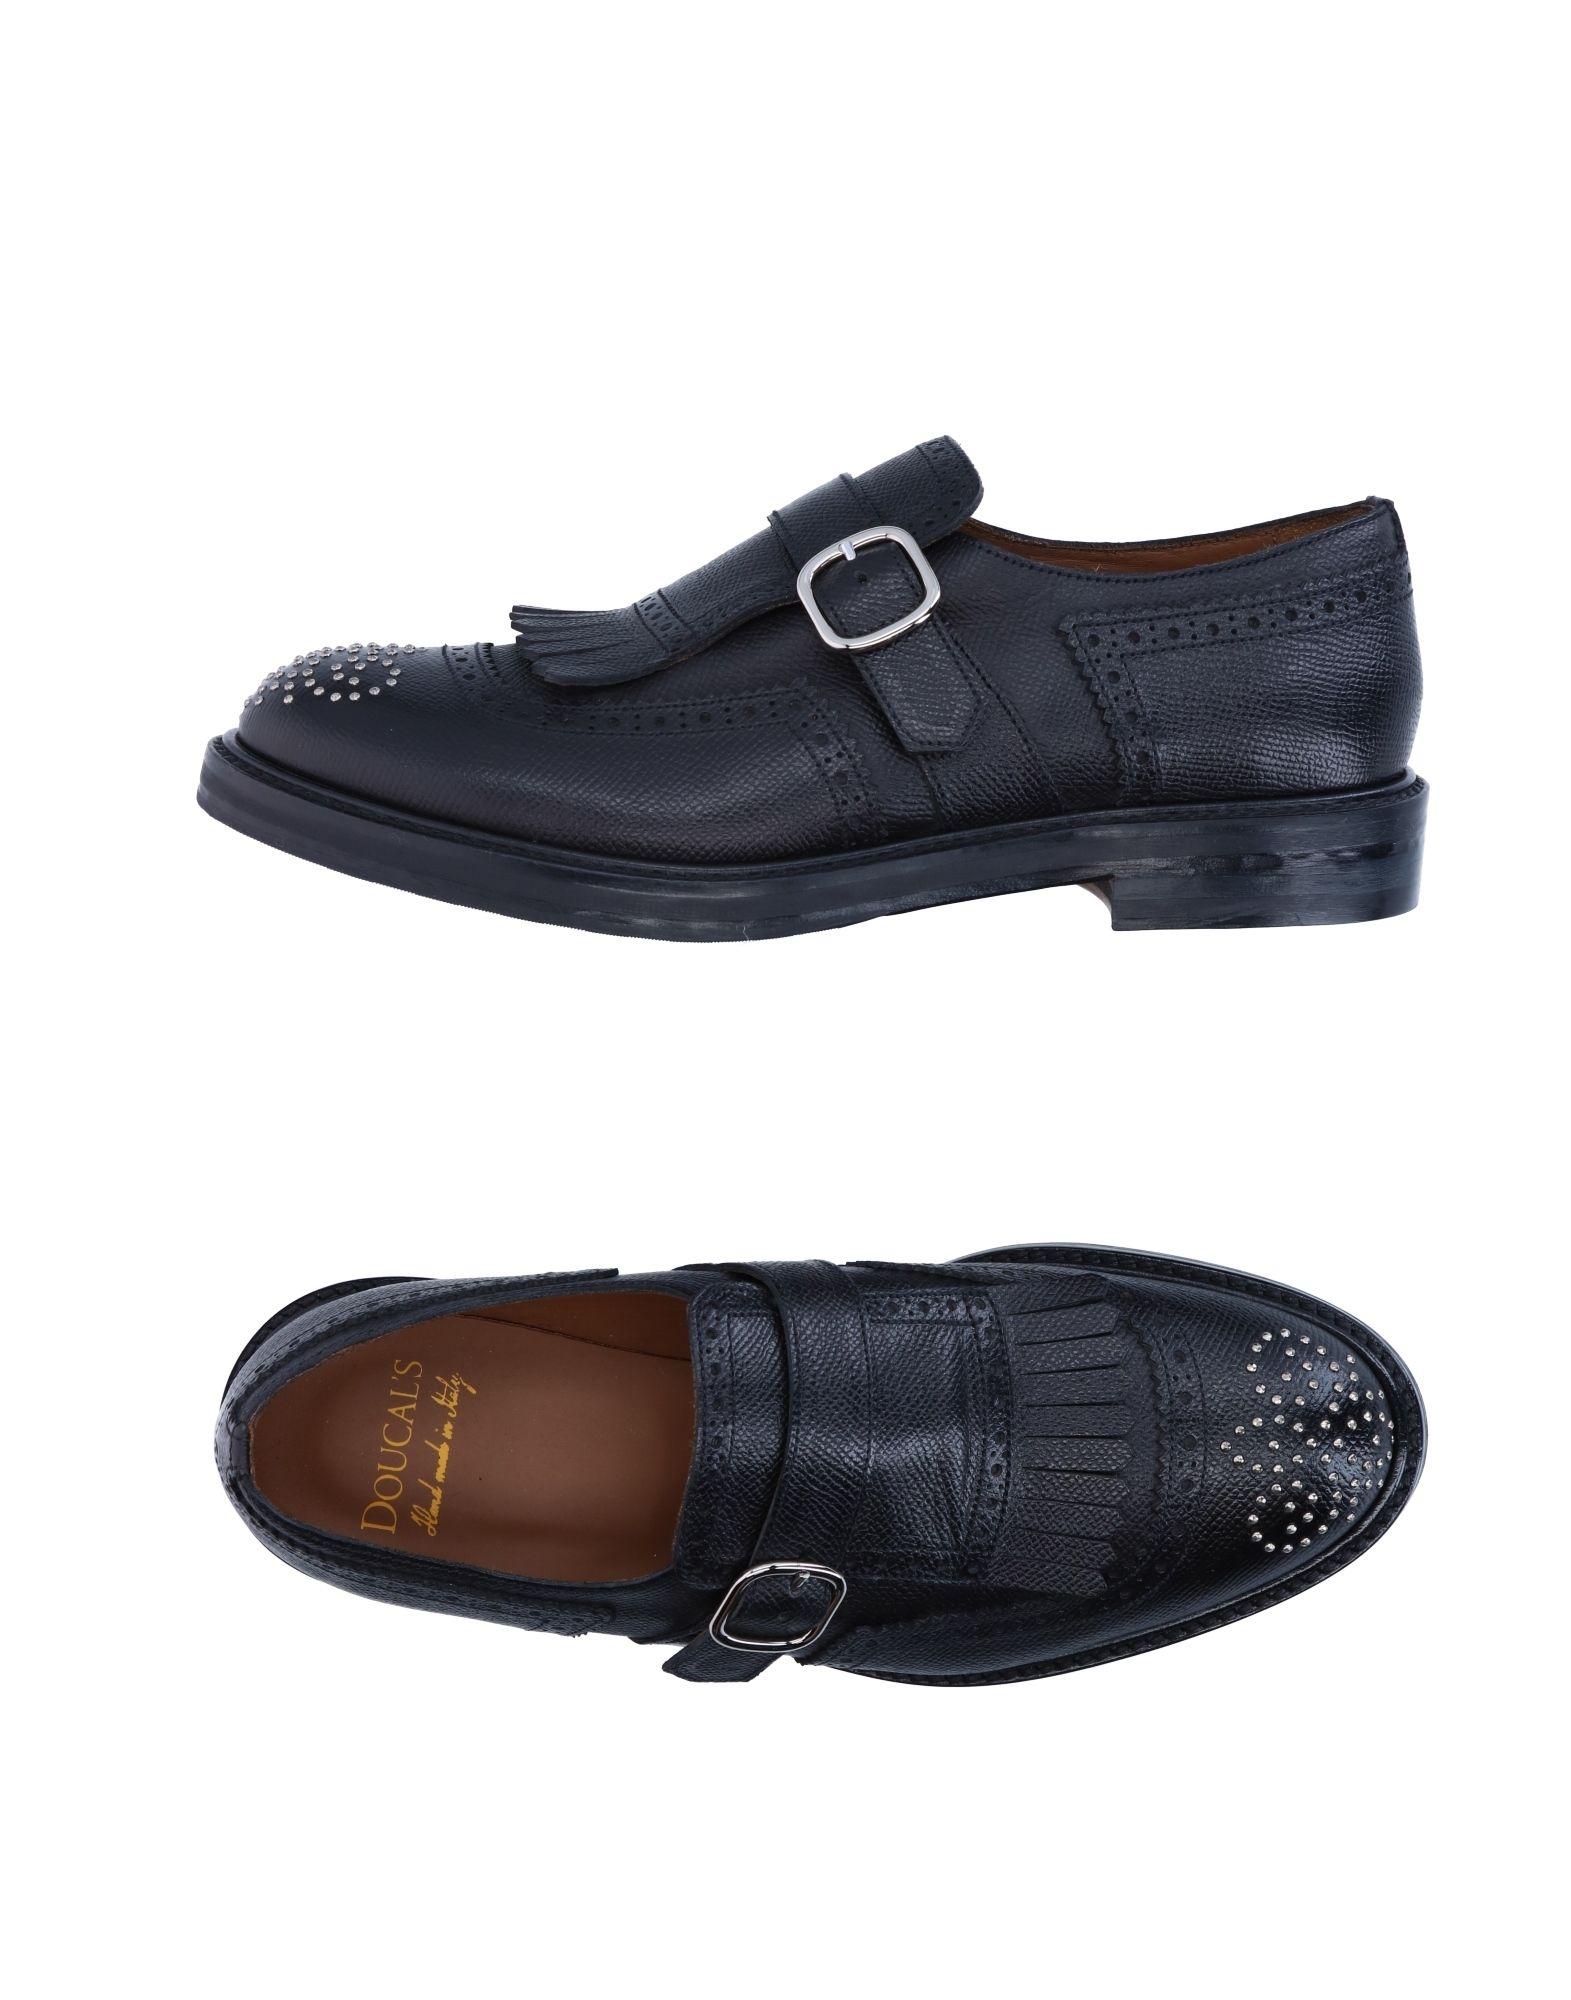 Stilvolle billige  Schuhe Doucal's Schnürschuhe Damen  billige 11273111KJ 444620